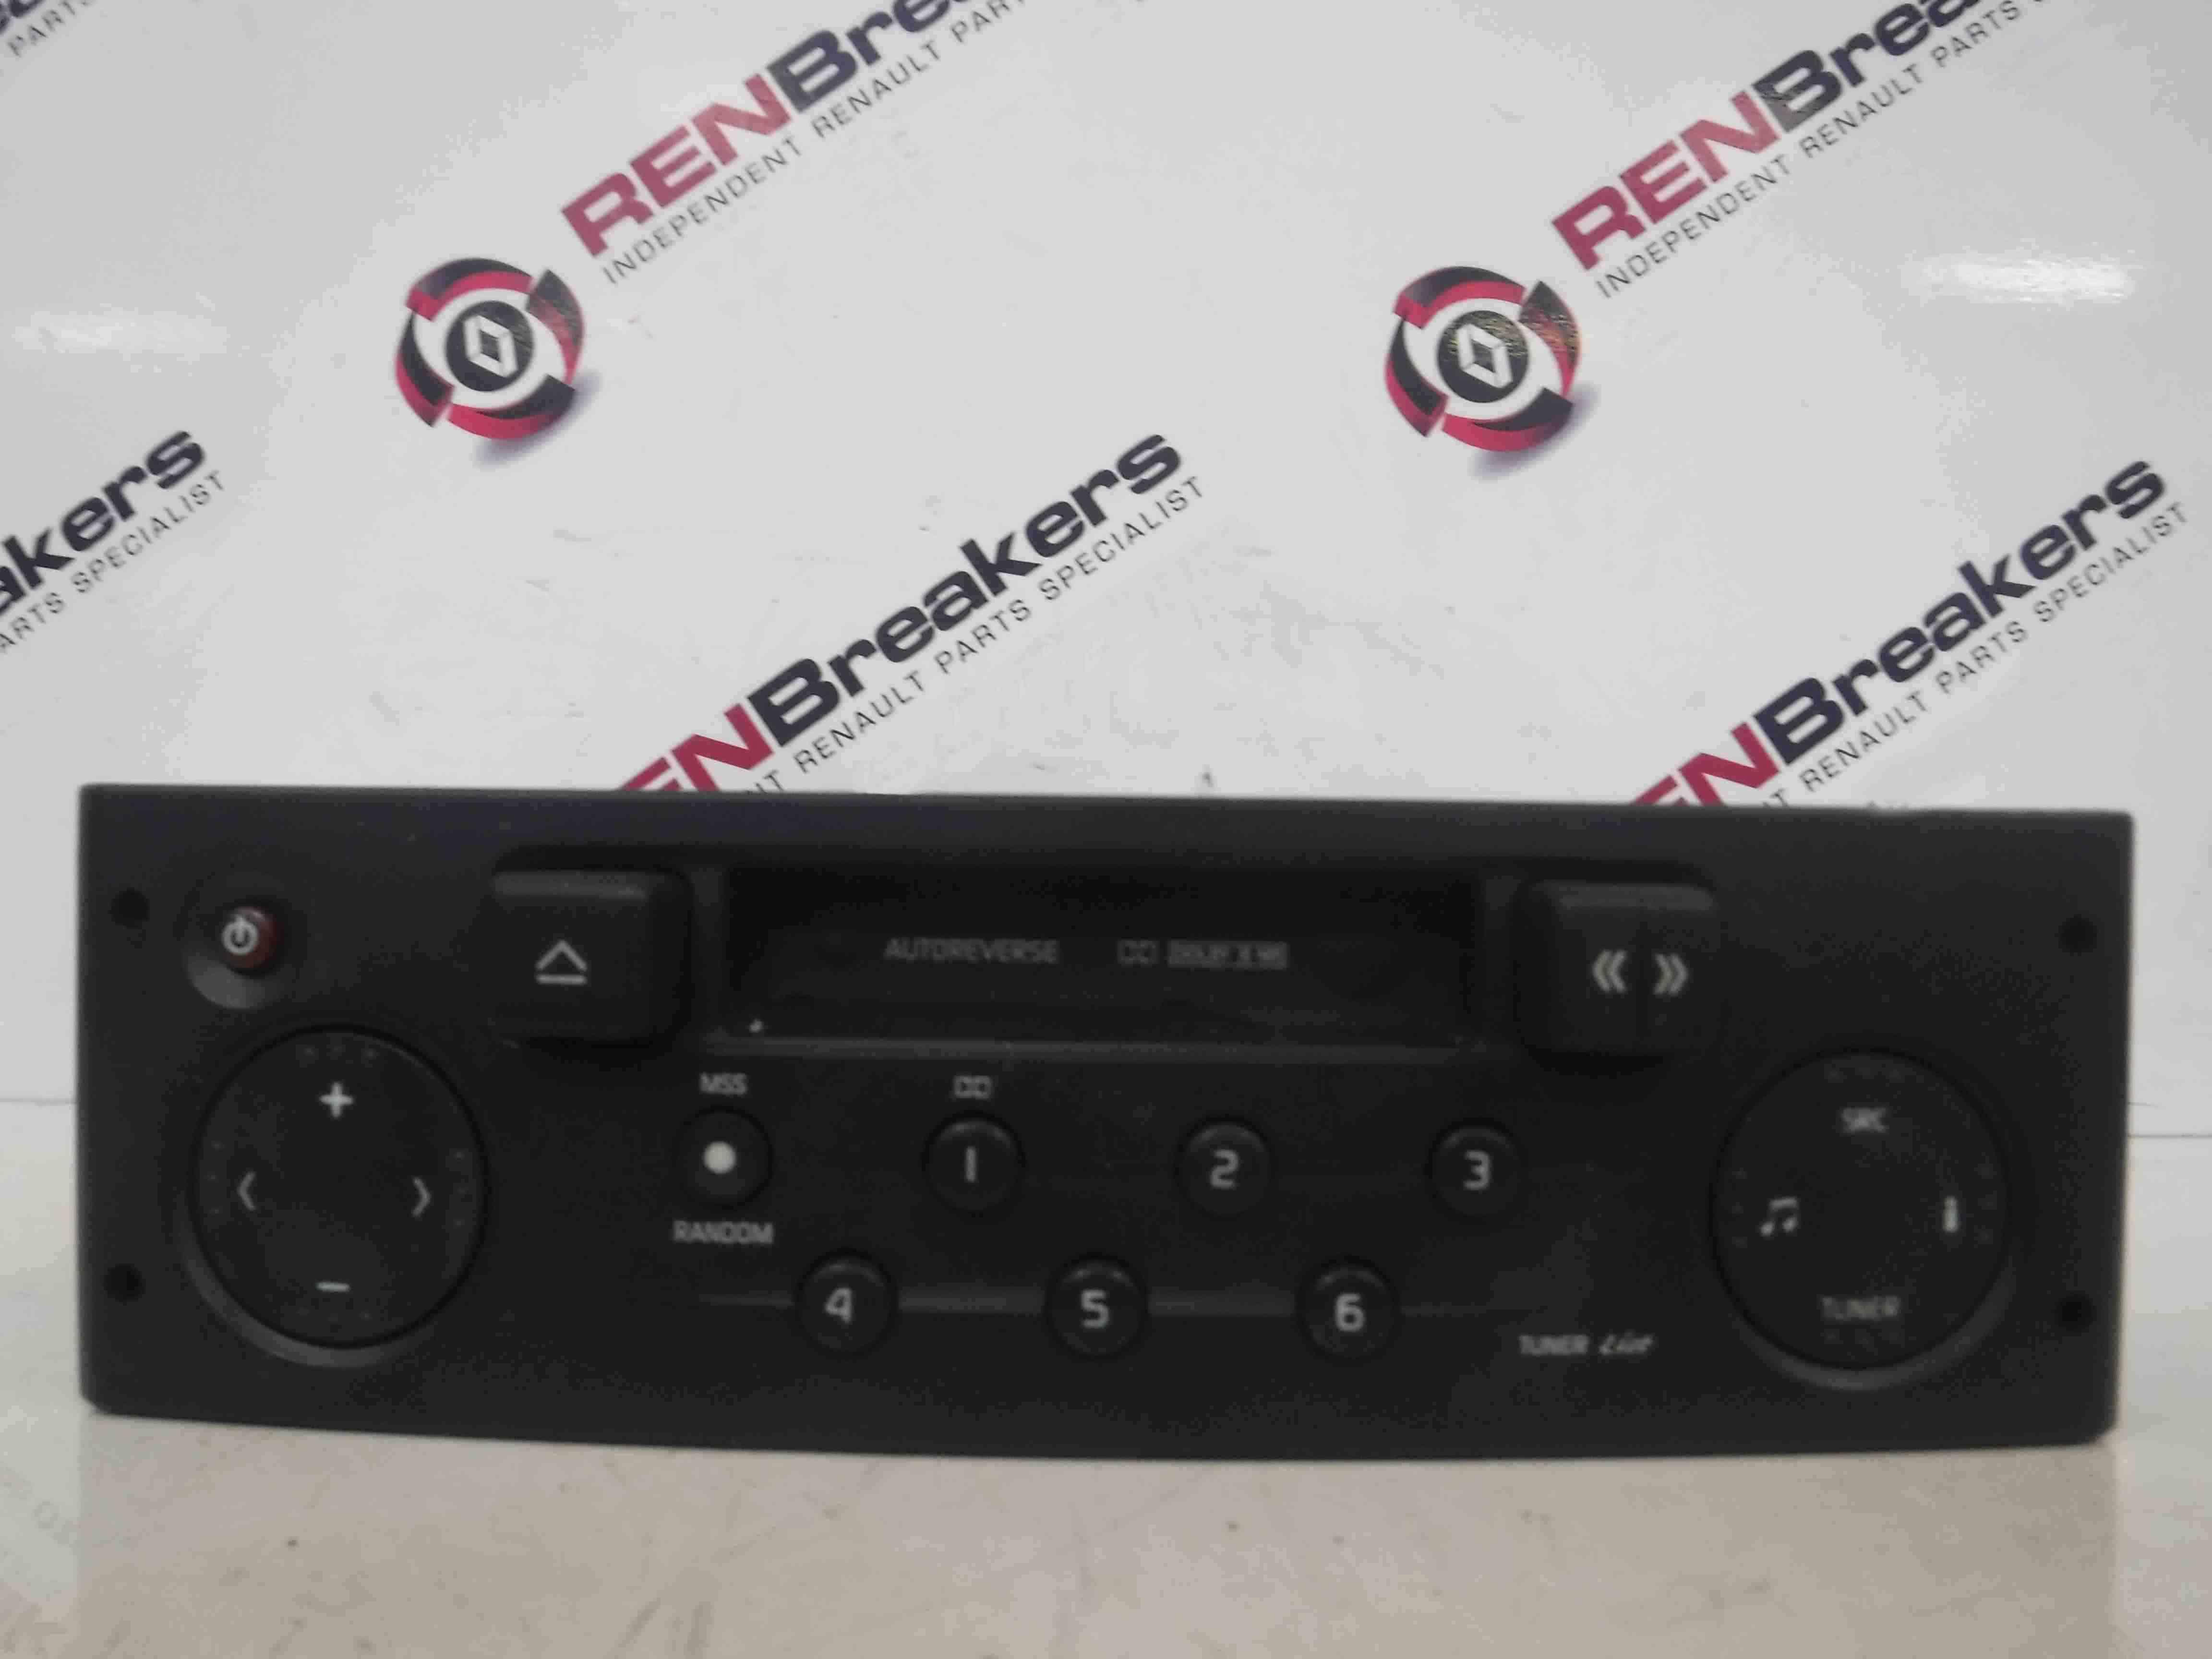 renault clio mk2 1998 2006 radio tape casette player code 8200029539 ebay. Black Bedroom Furniture Sets. Home Design Ideas